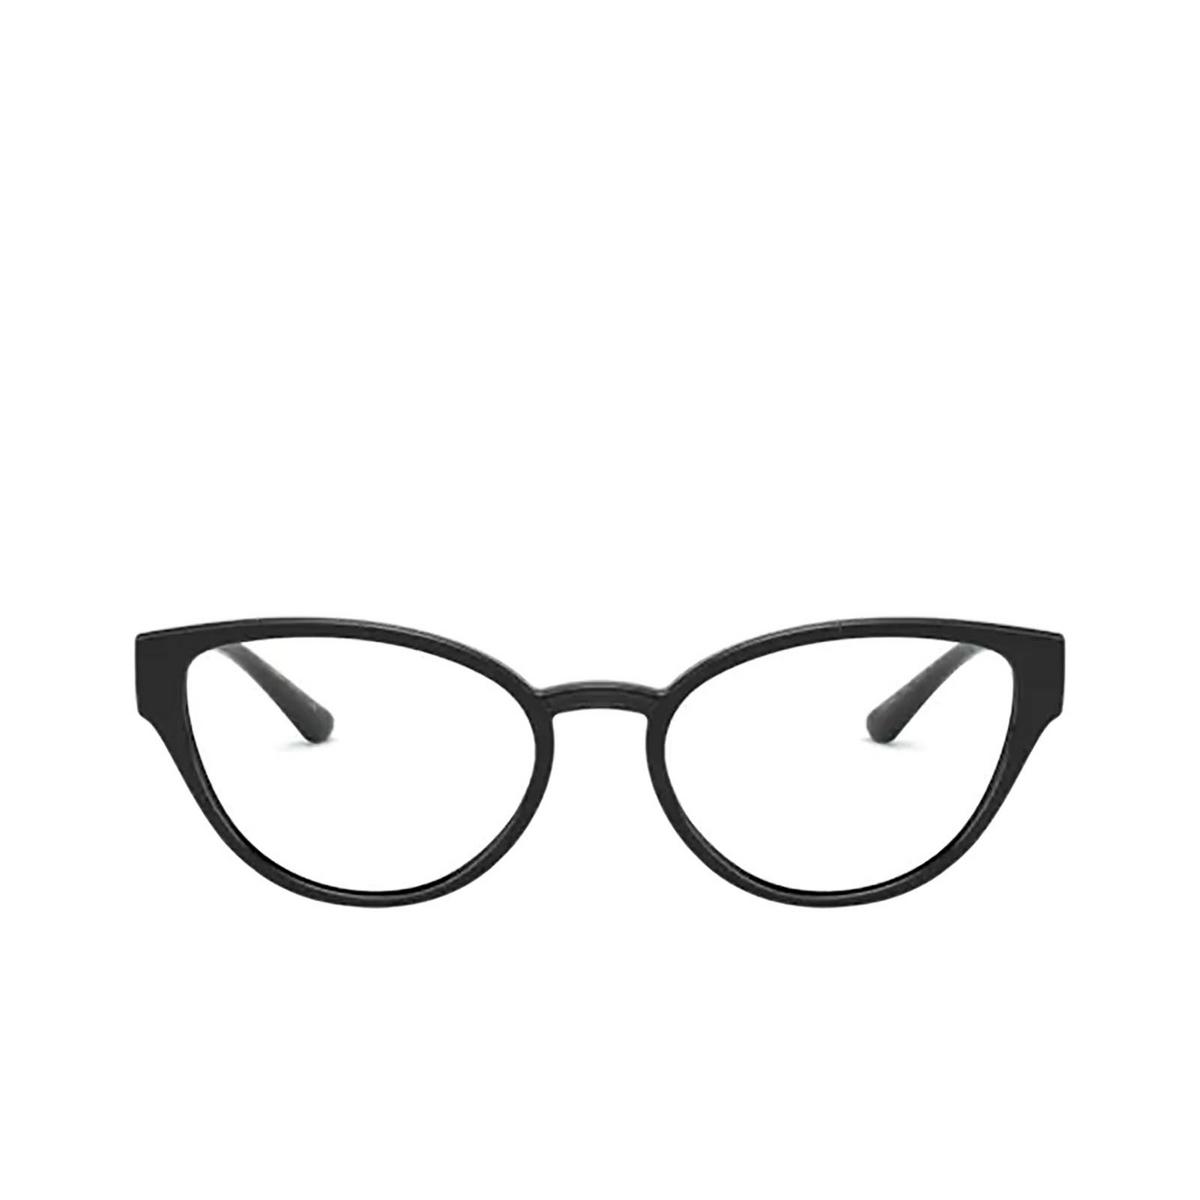 Dolce & Gabbana® Cat-eye Eyeglasses: DG5055 color Black 5012 - front view.